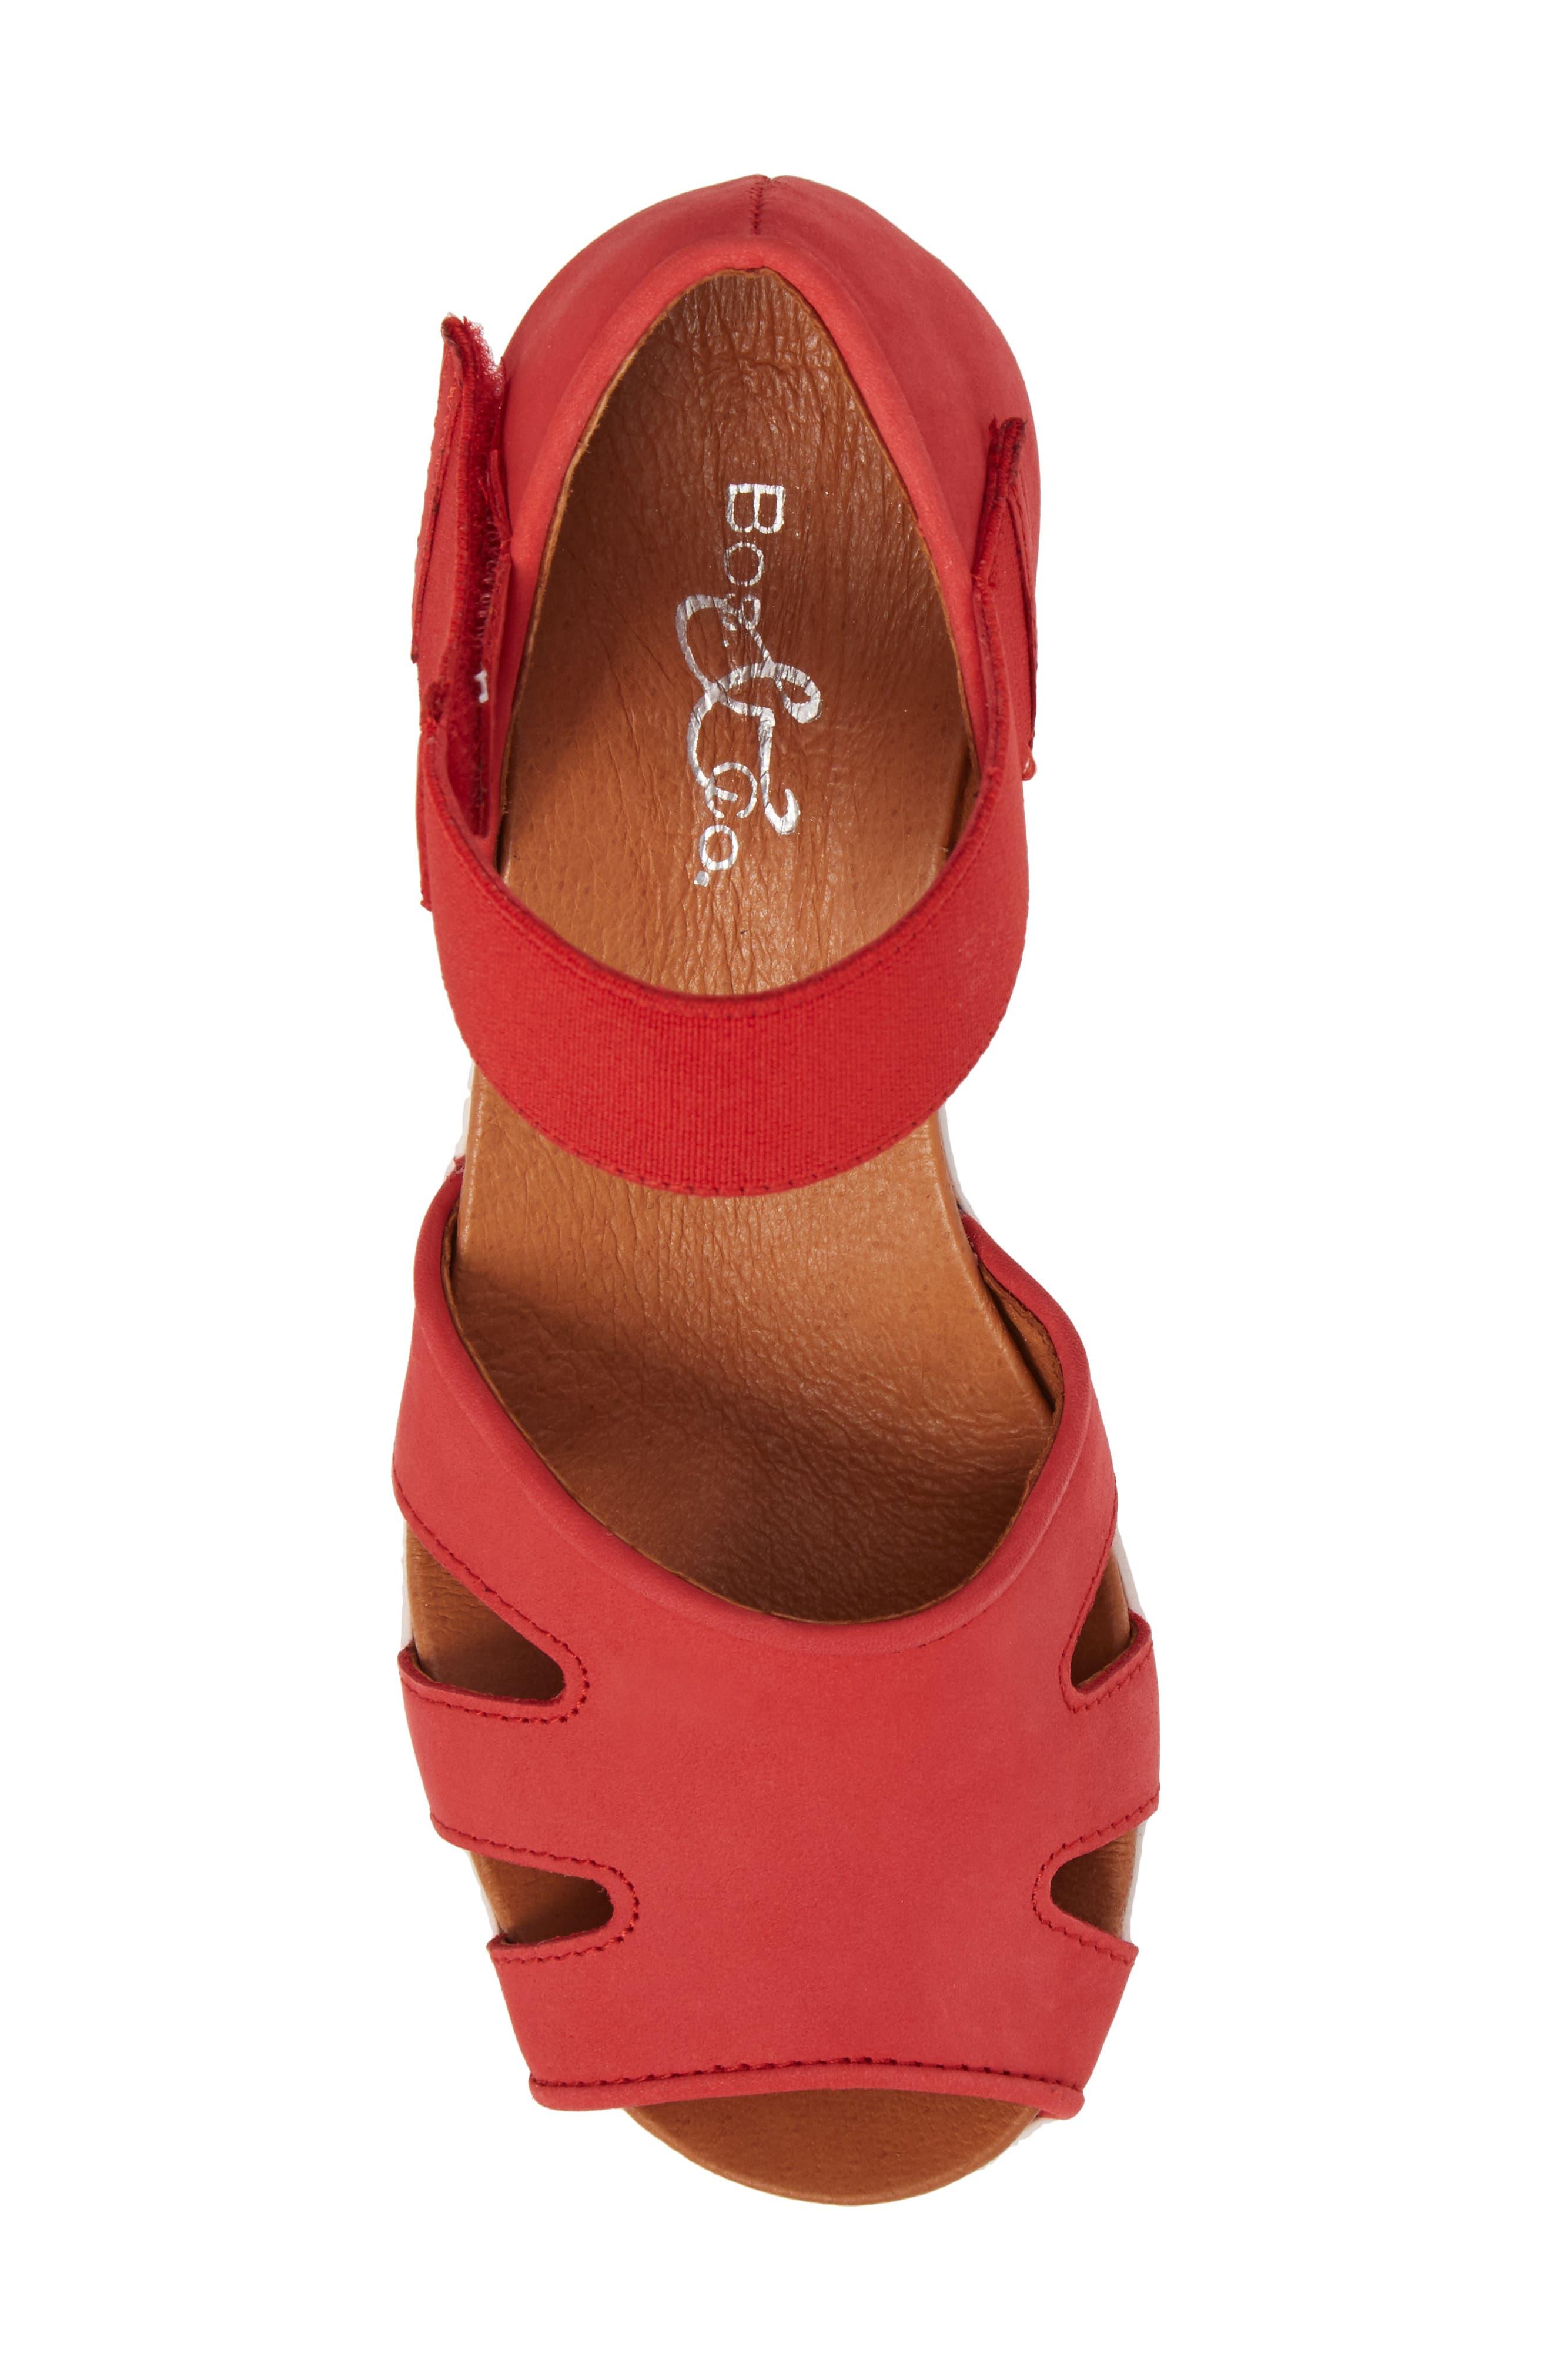 Sharon Platform Wedge Sandal,                             Alternate thumbnail 5, color,                             Red Nubuck Leather